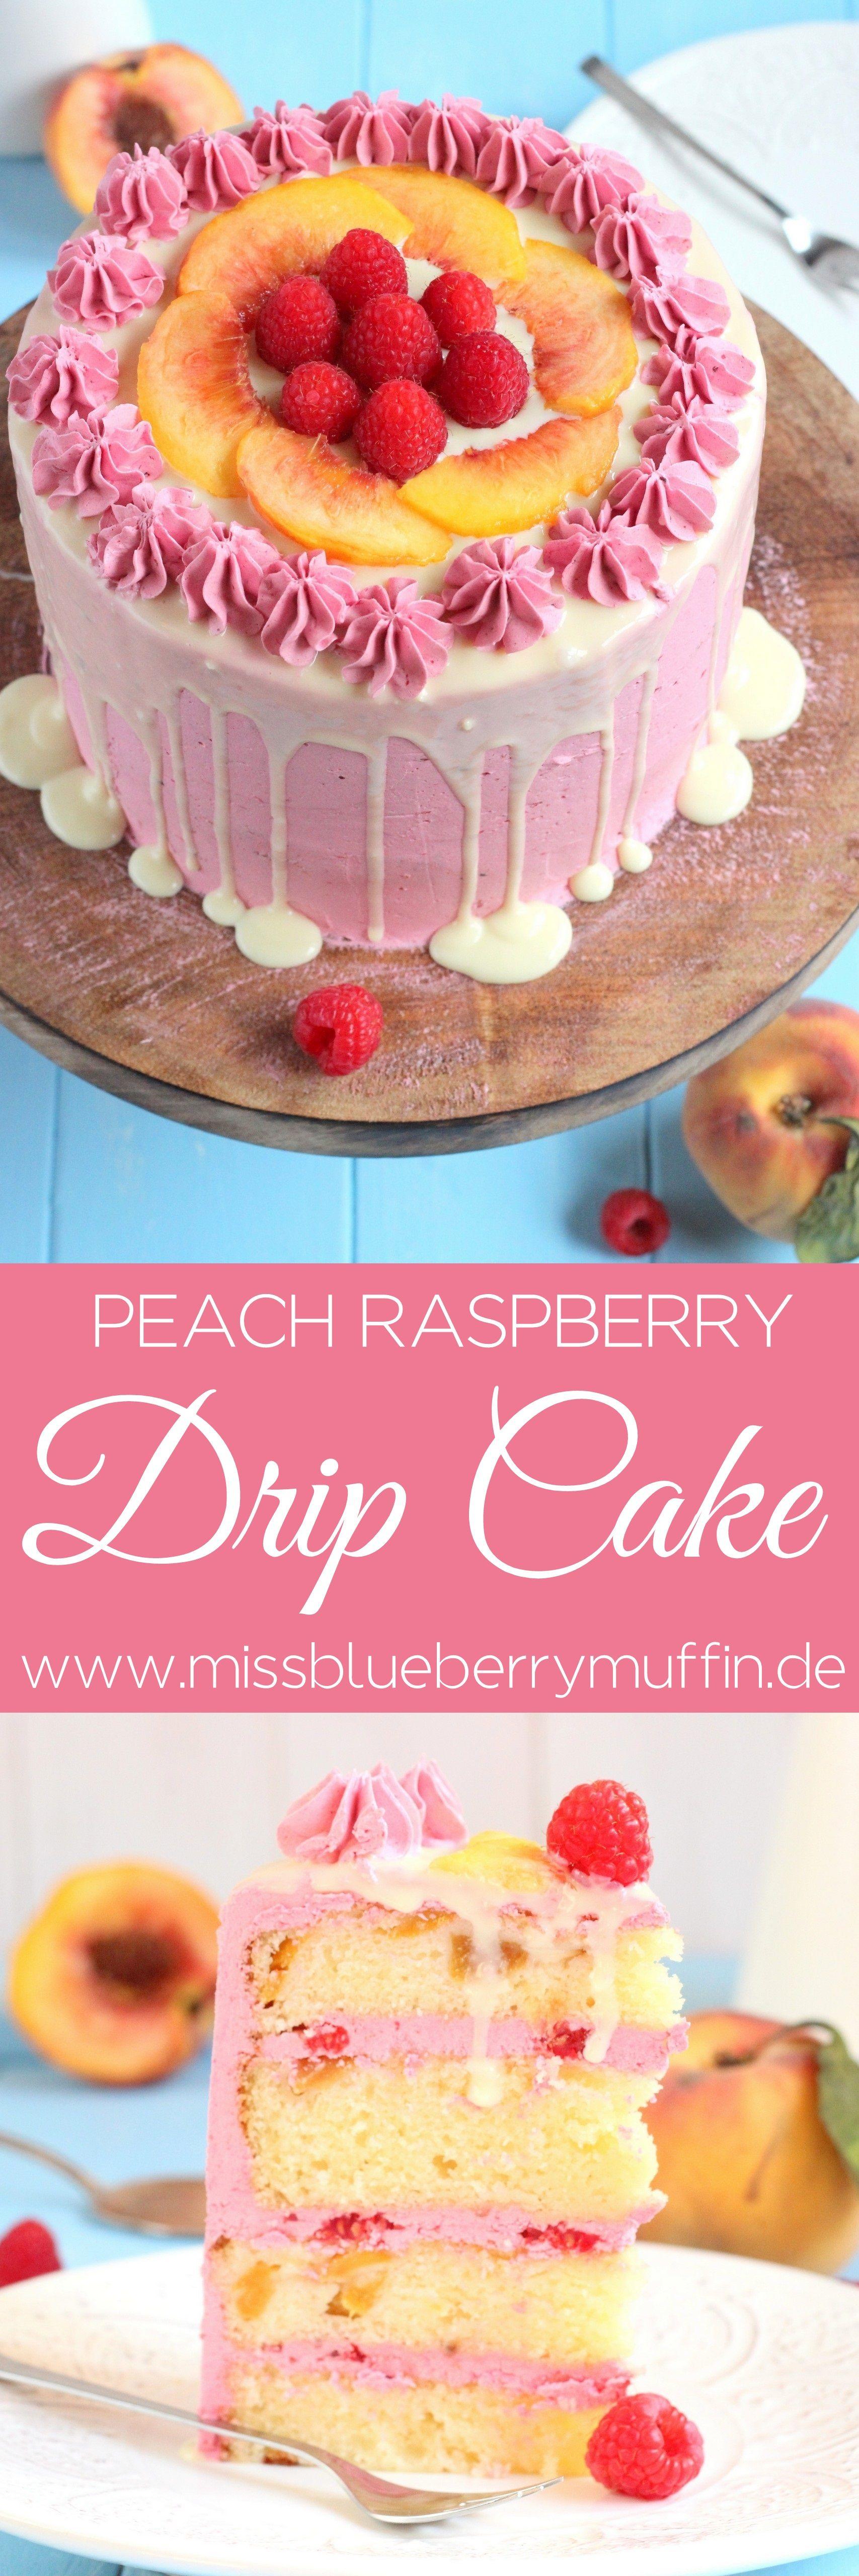 Pfirsich Himbeer Torte Peach Raspberry Drip Cake 3